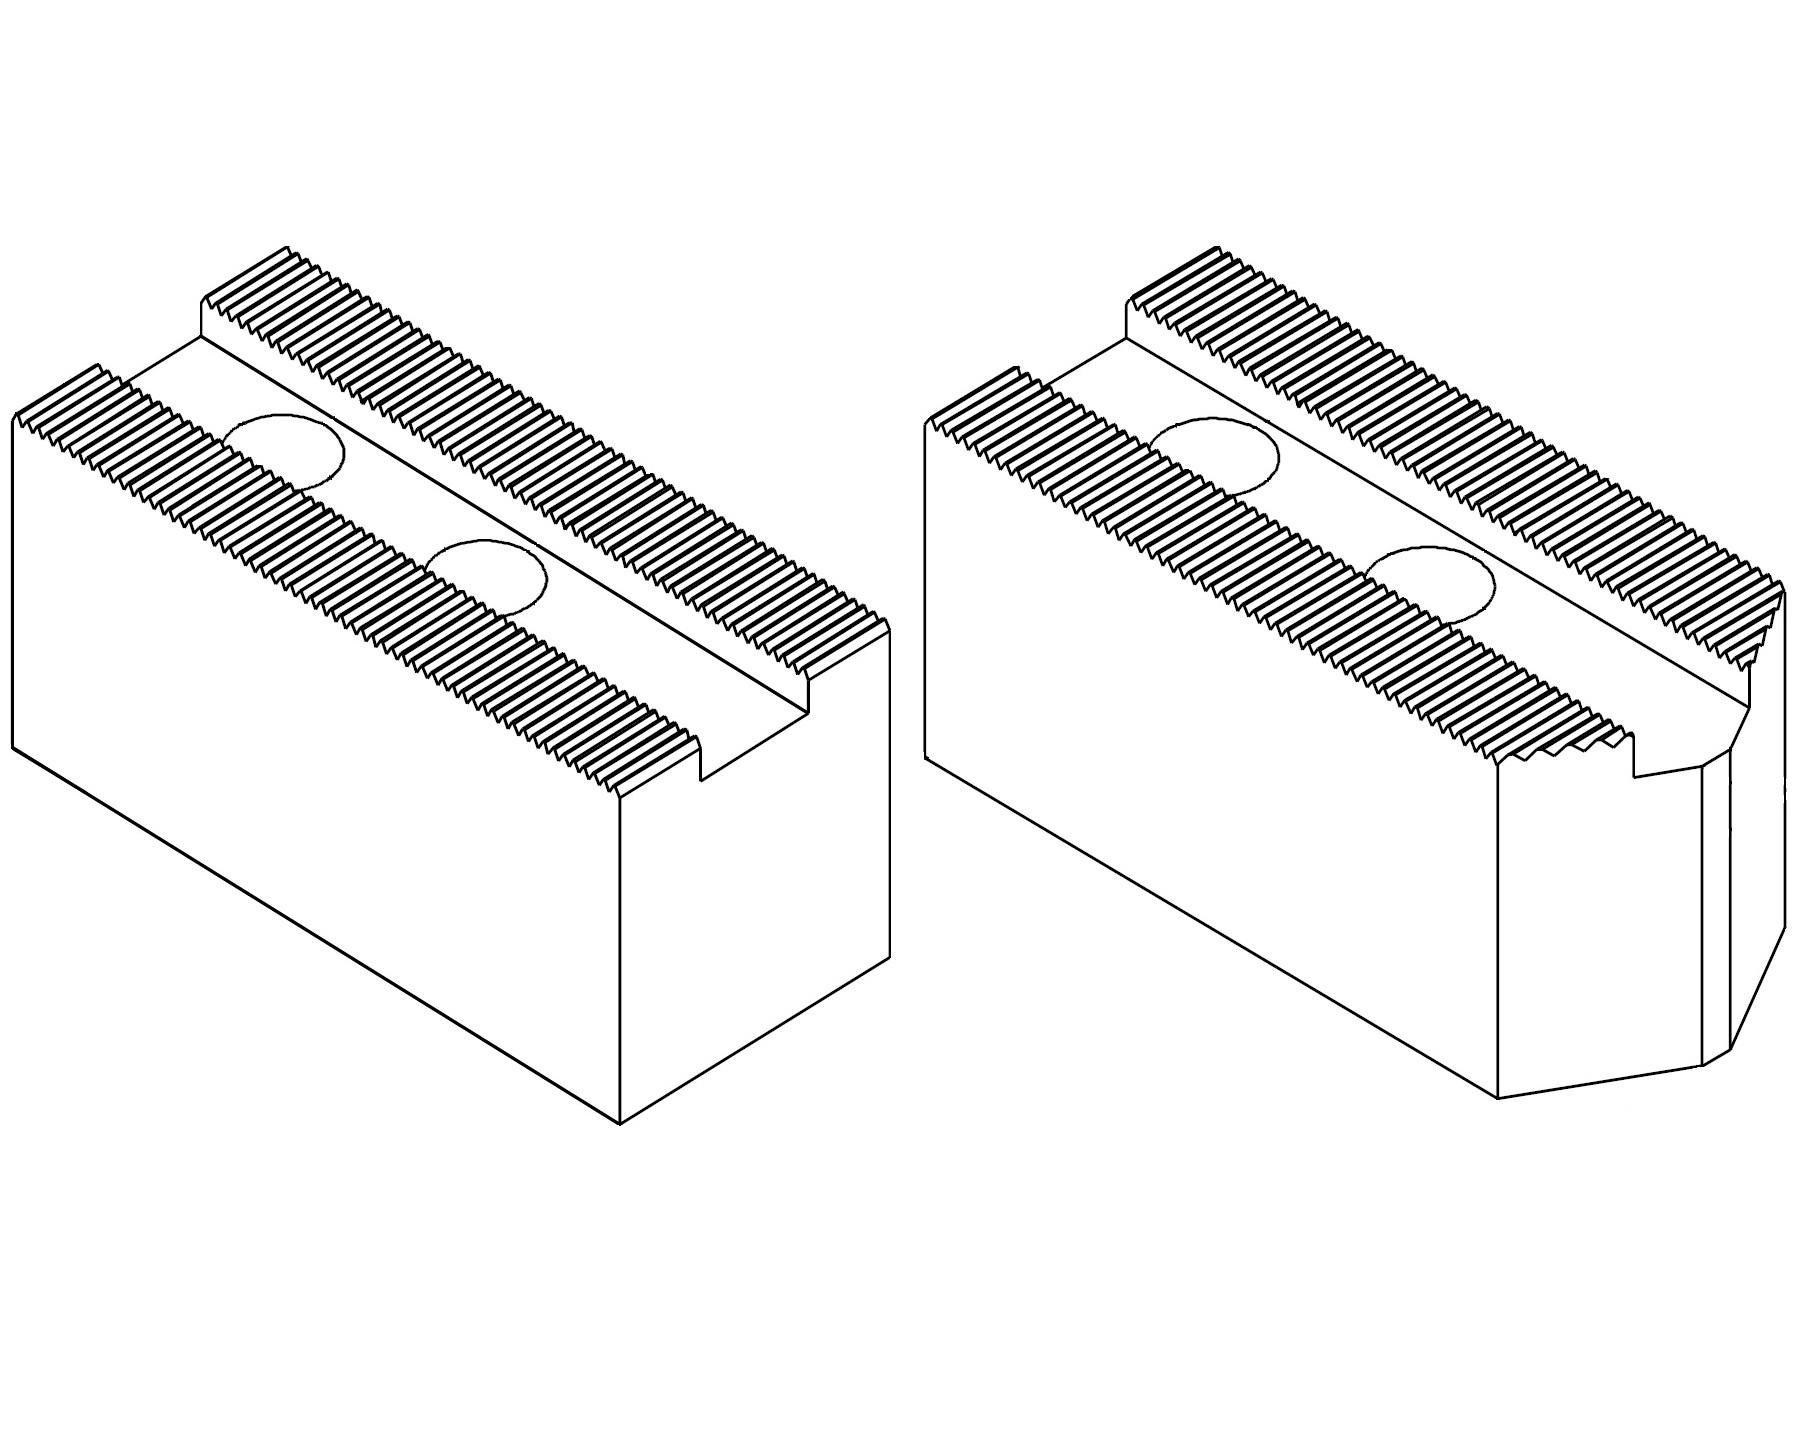 Čelisti měkké 1,5x60°, šířka drážky - 18 (sklíčidla pr. 300mm)